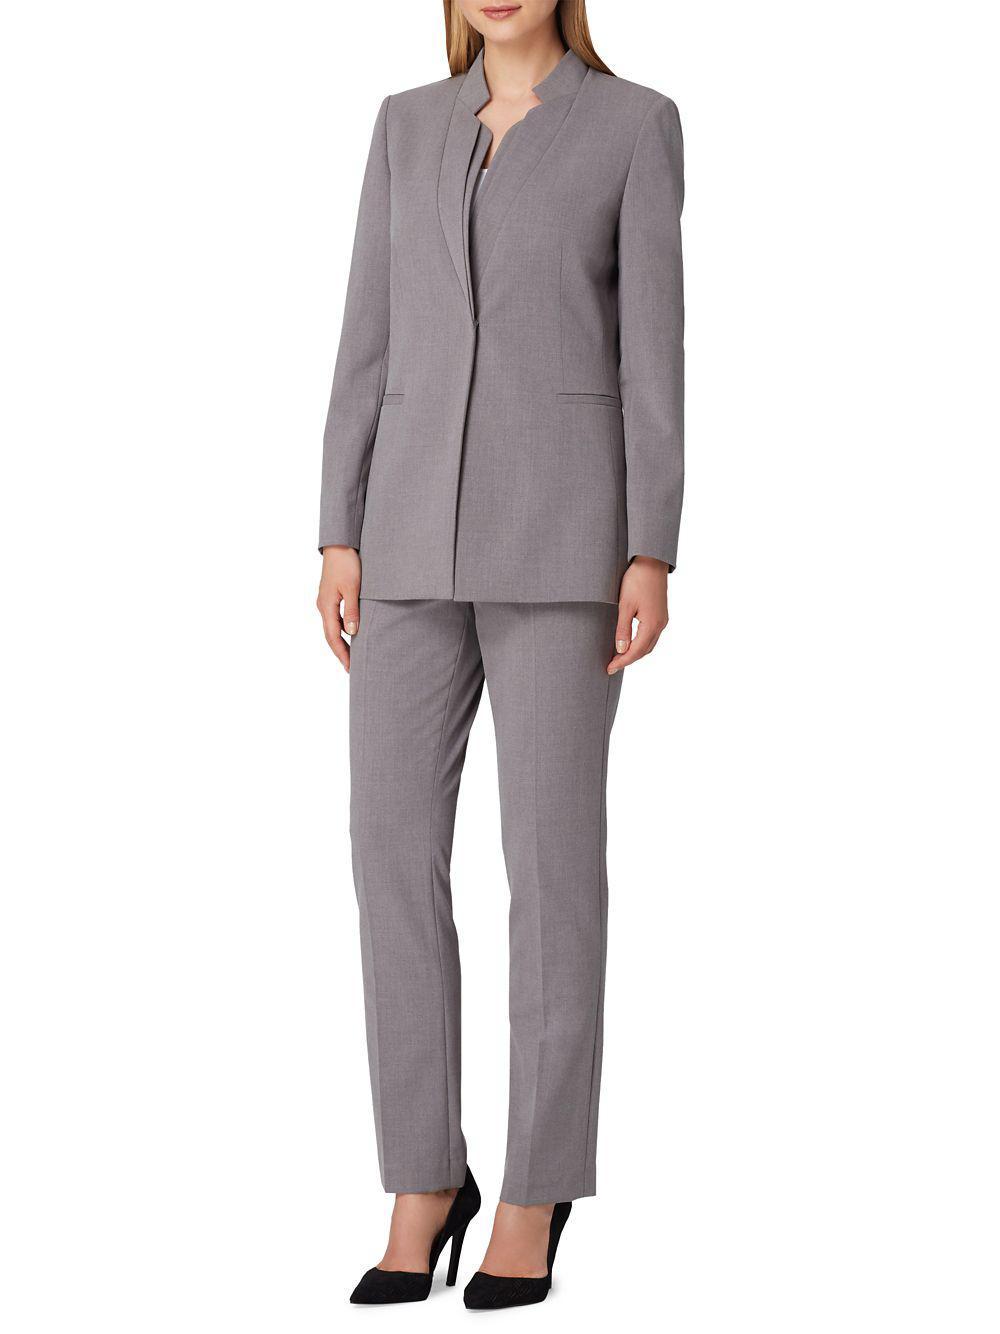 d4147c84546b6 Tahari Double Starneck Pant Suit in Gray - Lyst